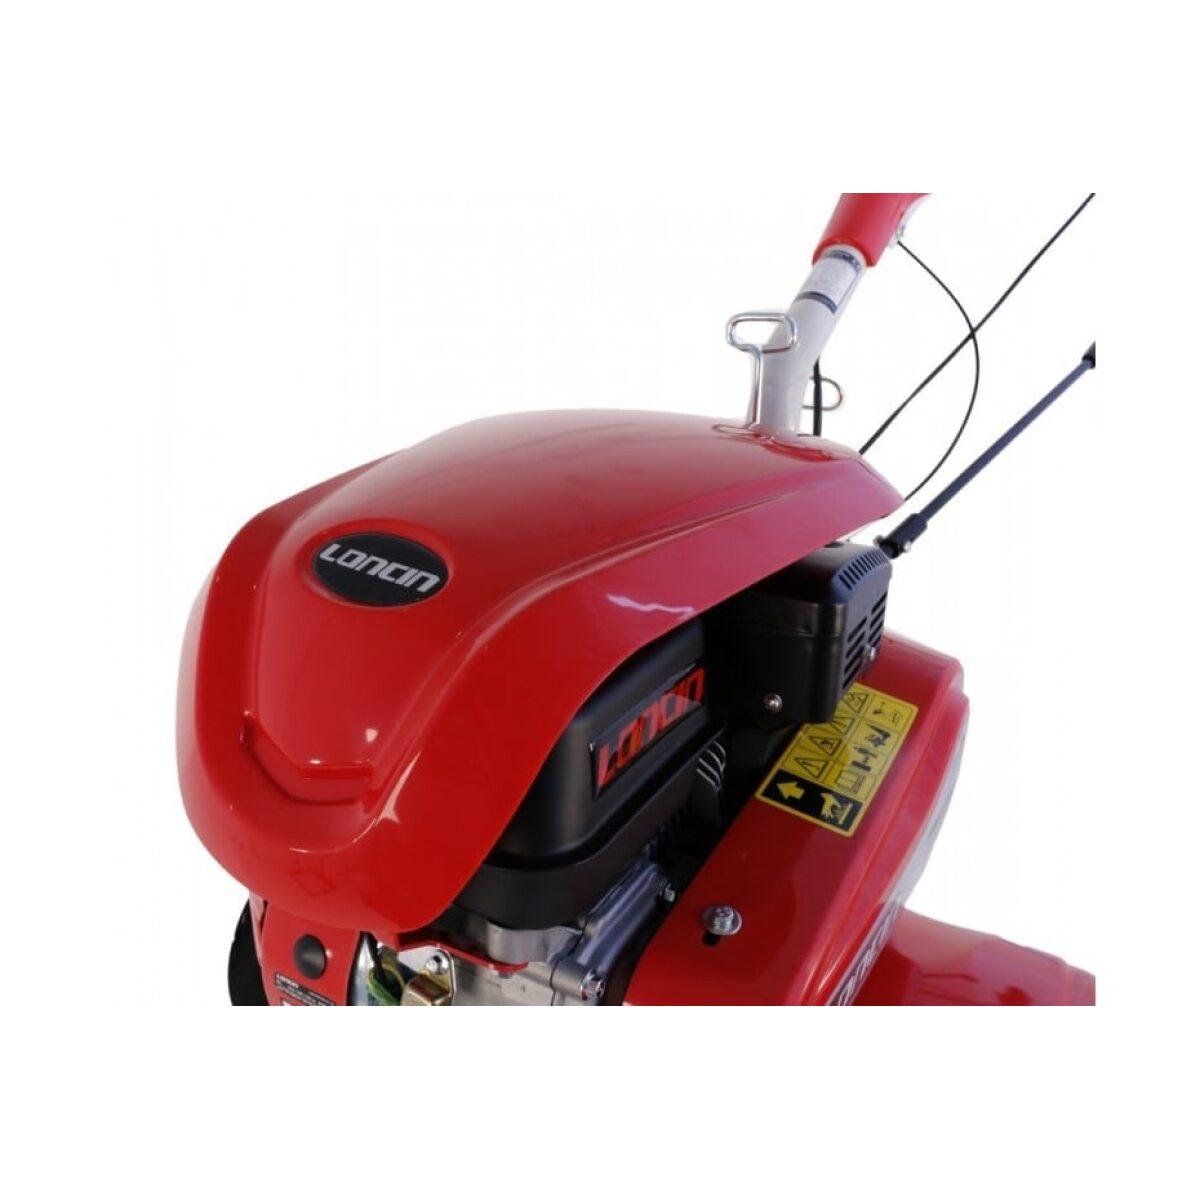 motocultor loncin lc750 7cp o mac.ro 9 65